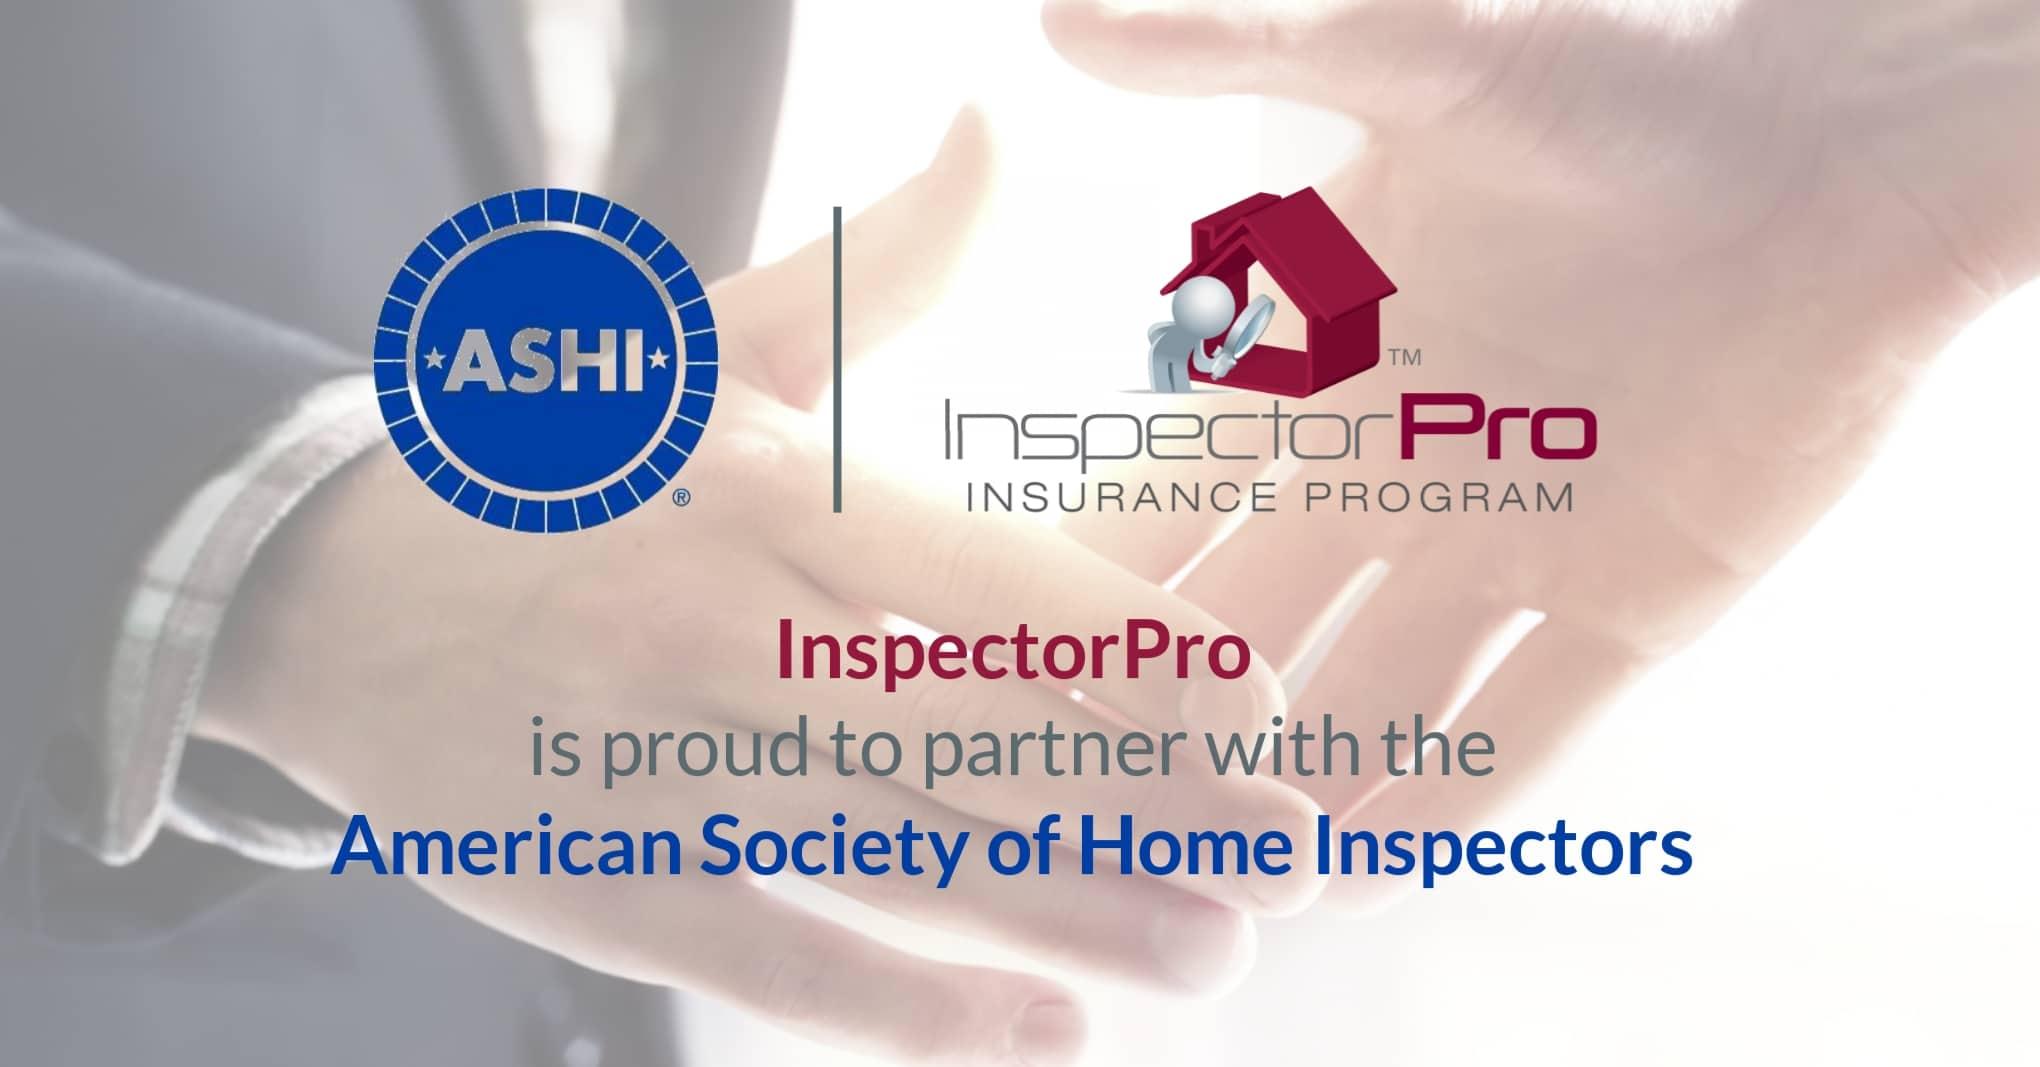 ASHI partnership announcement